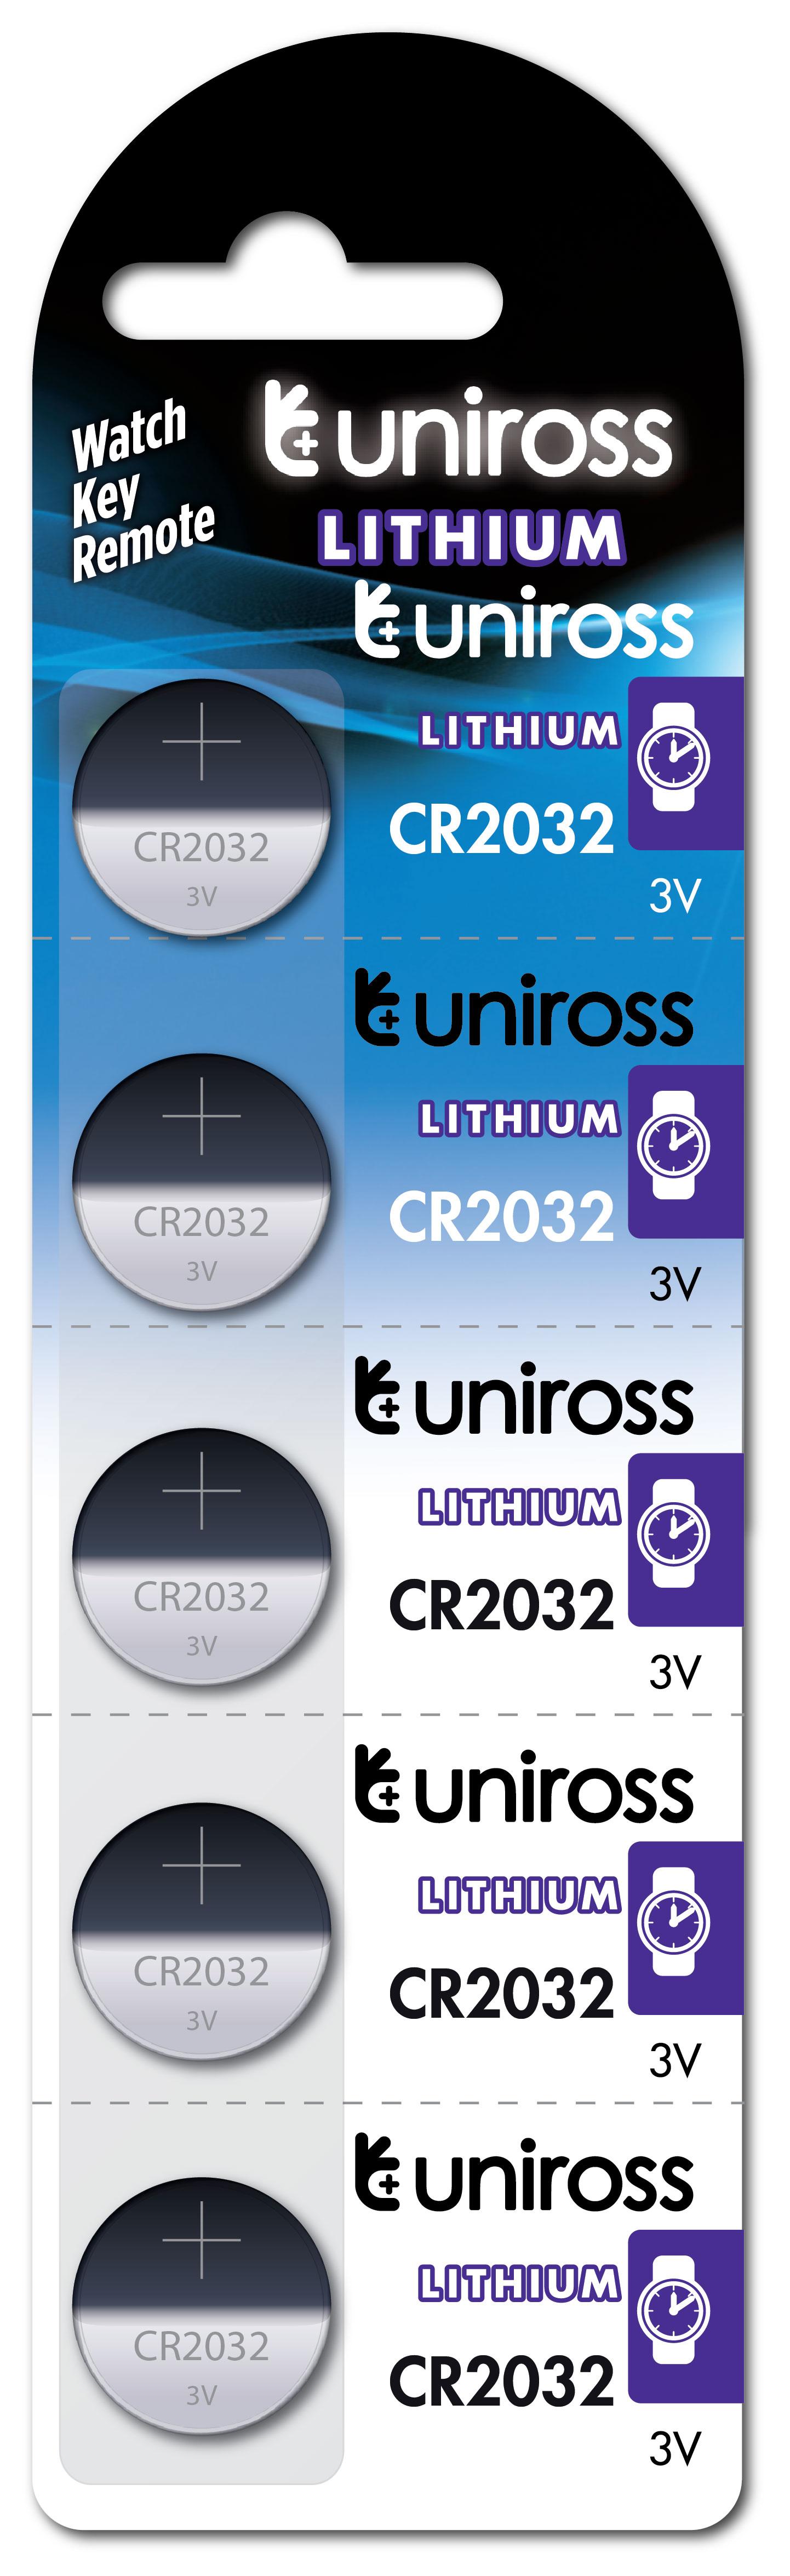 Button_Cell_[U5CR2032] UNIROSS BP5 CR2032 LITHIUM.jpg